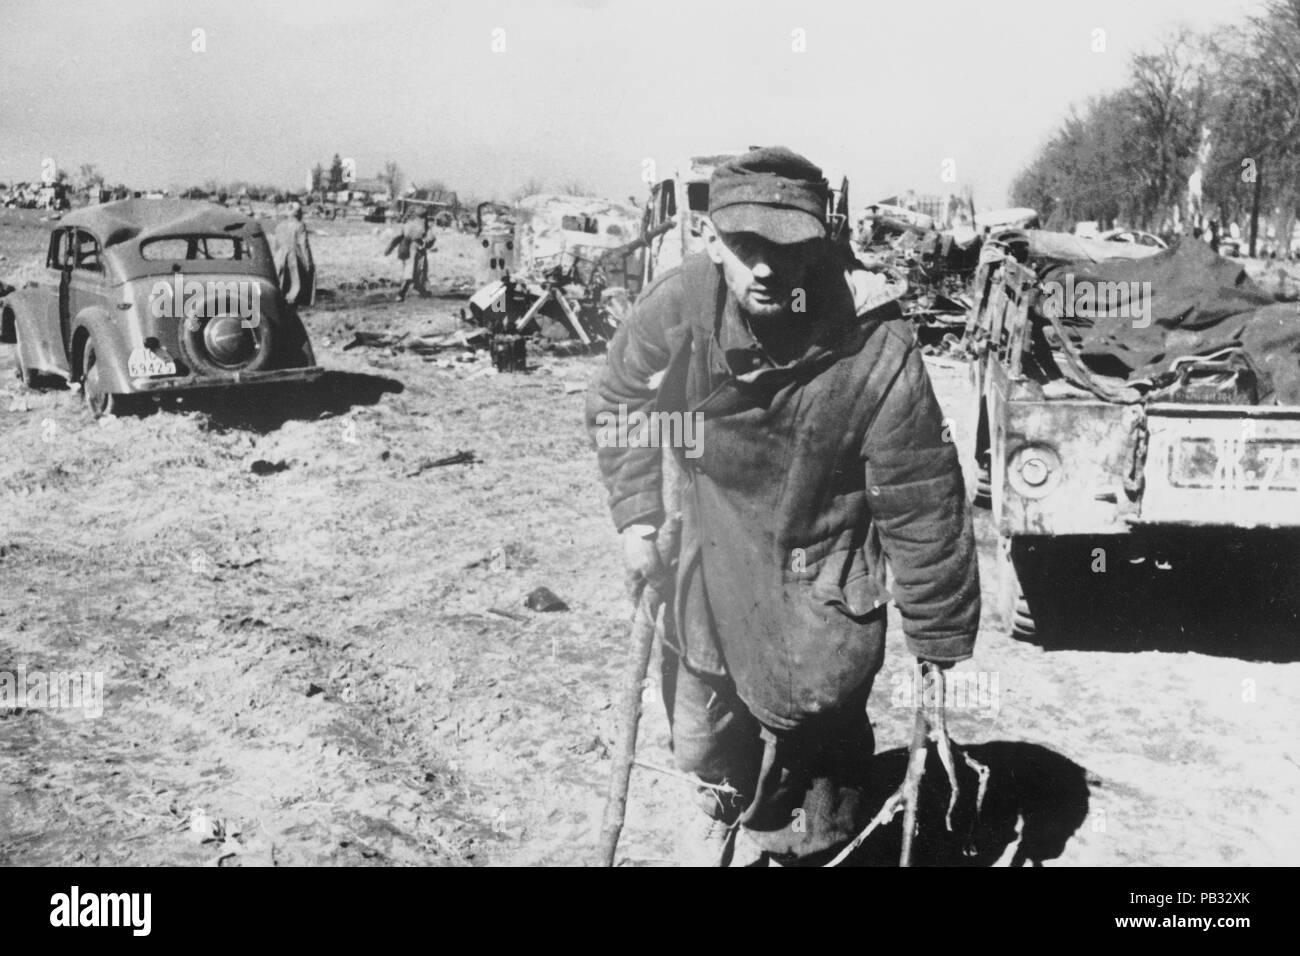 II world war, german soldier injured - Stock Image